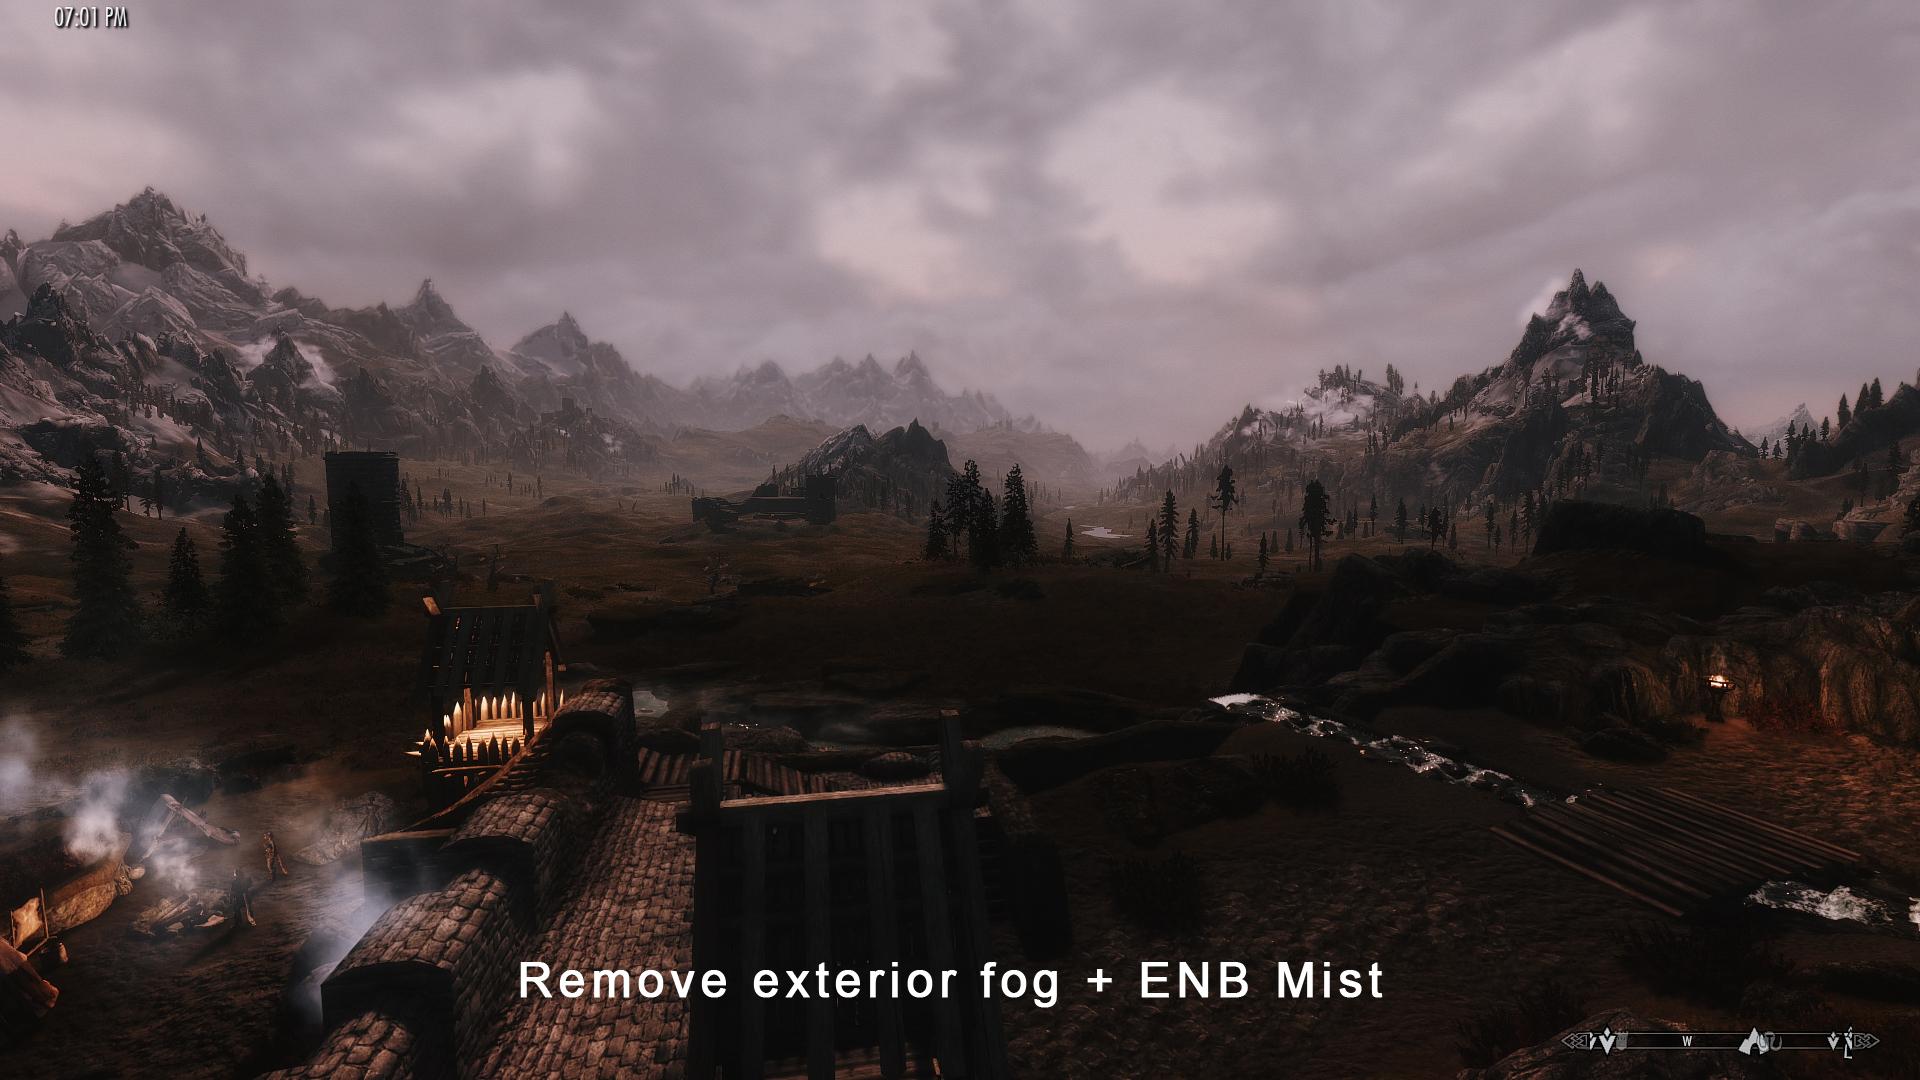 Remove Exterior Fog